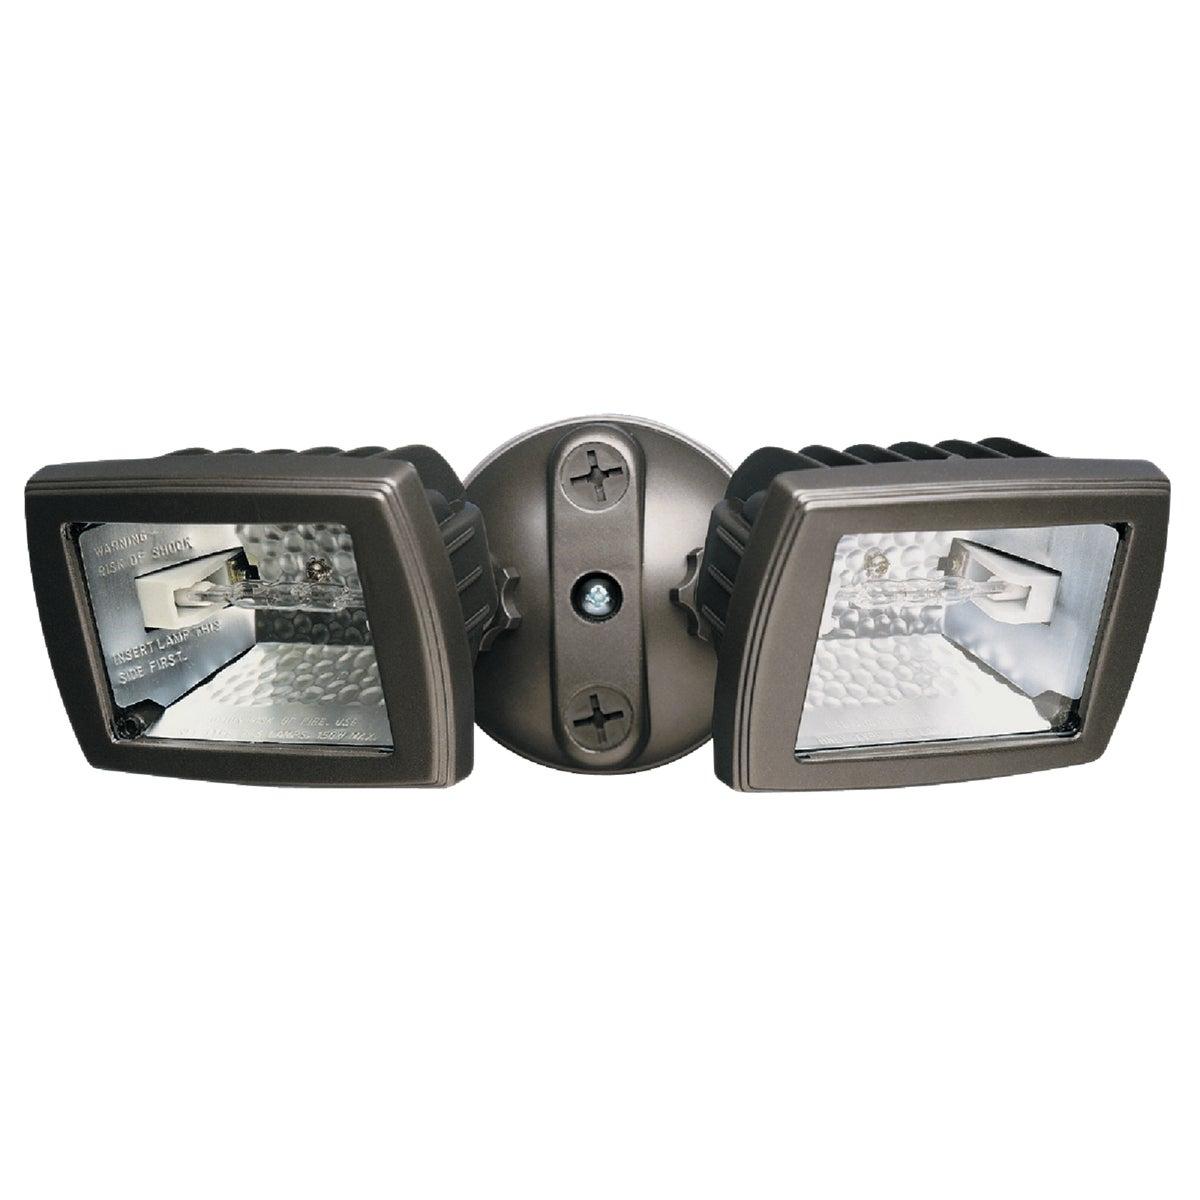 TWIN BRZ QUARTZ FIXTURE - TMQ150 by Cooper Lighting